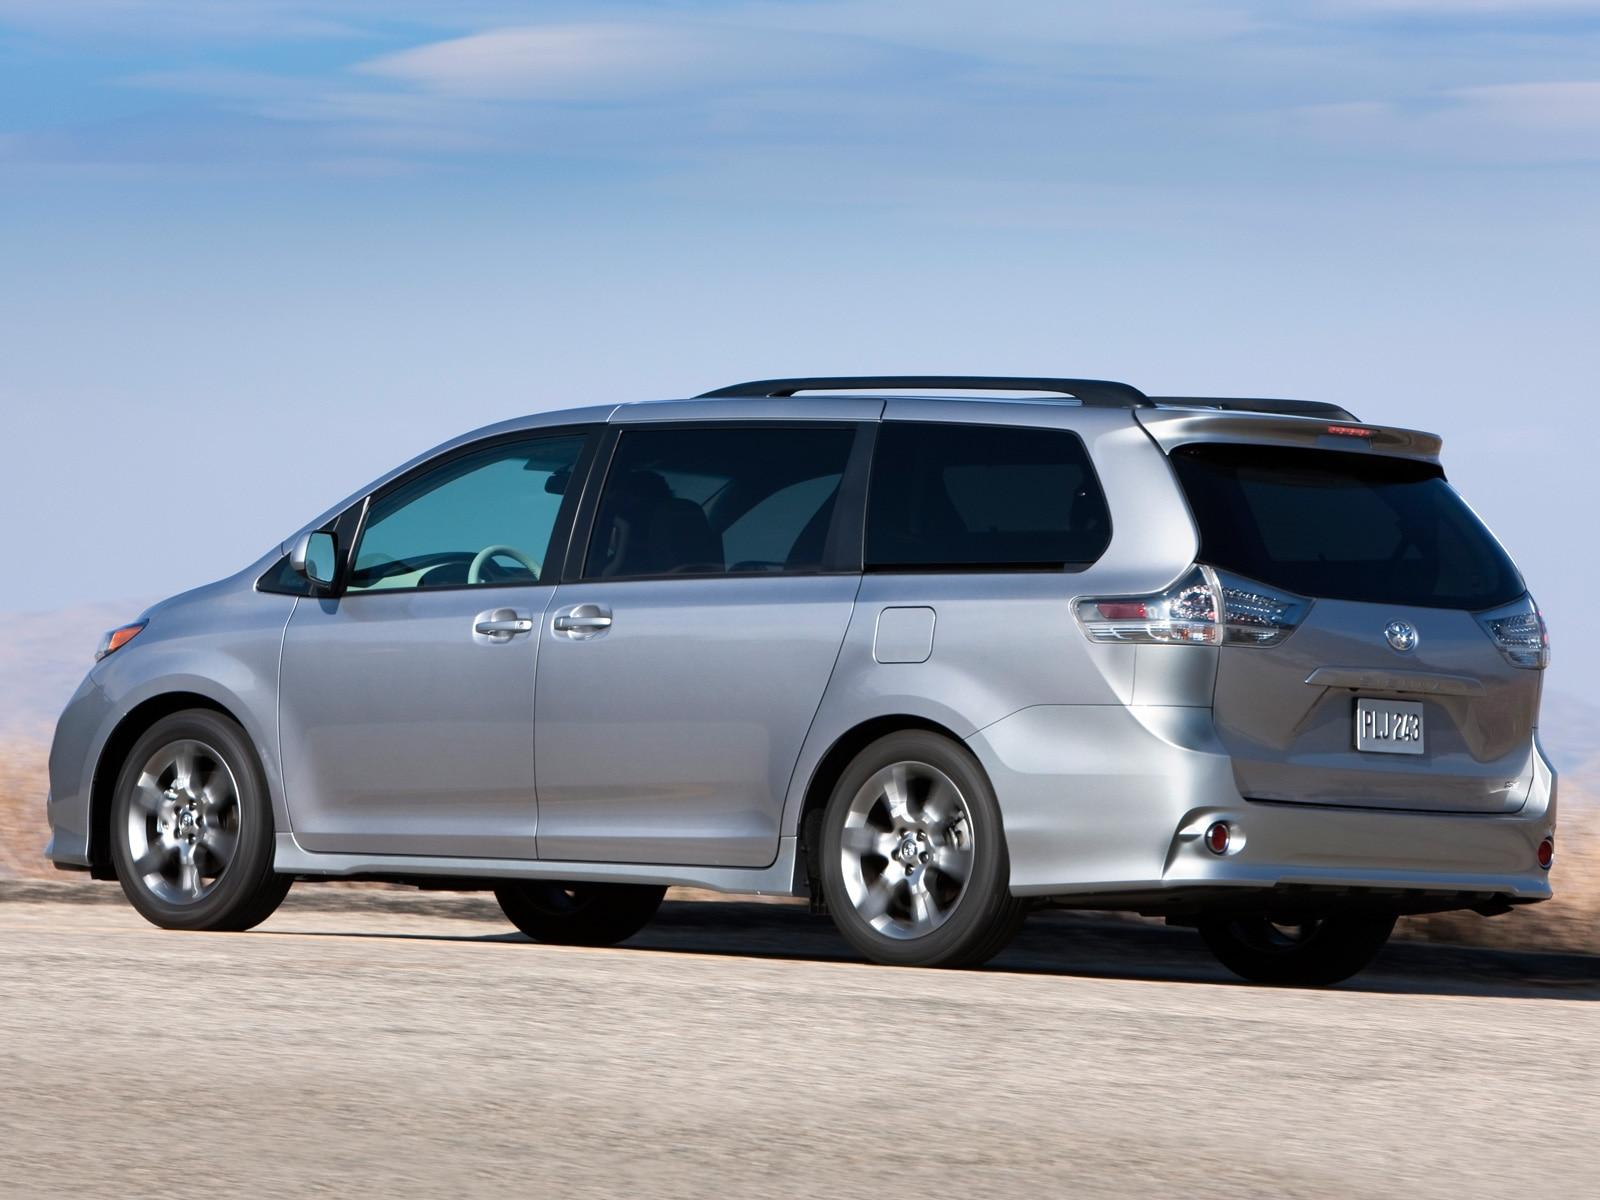 2011 toyota sienna toyota minivan review automobile magazine. Black Bedroom Furniture Sets. Home Design Ideas